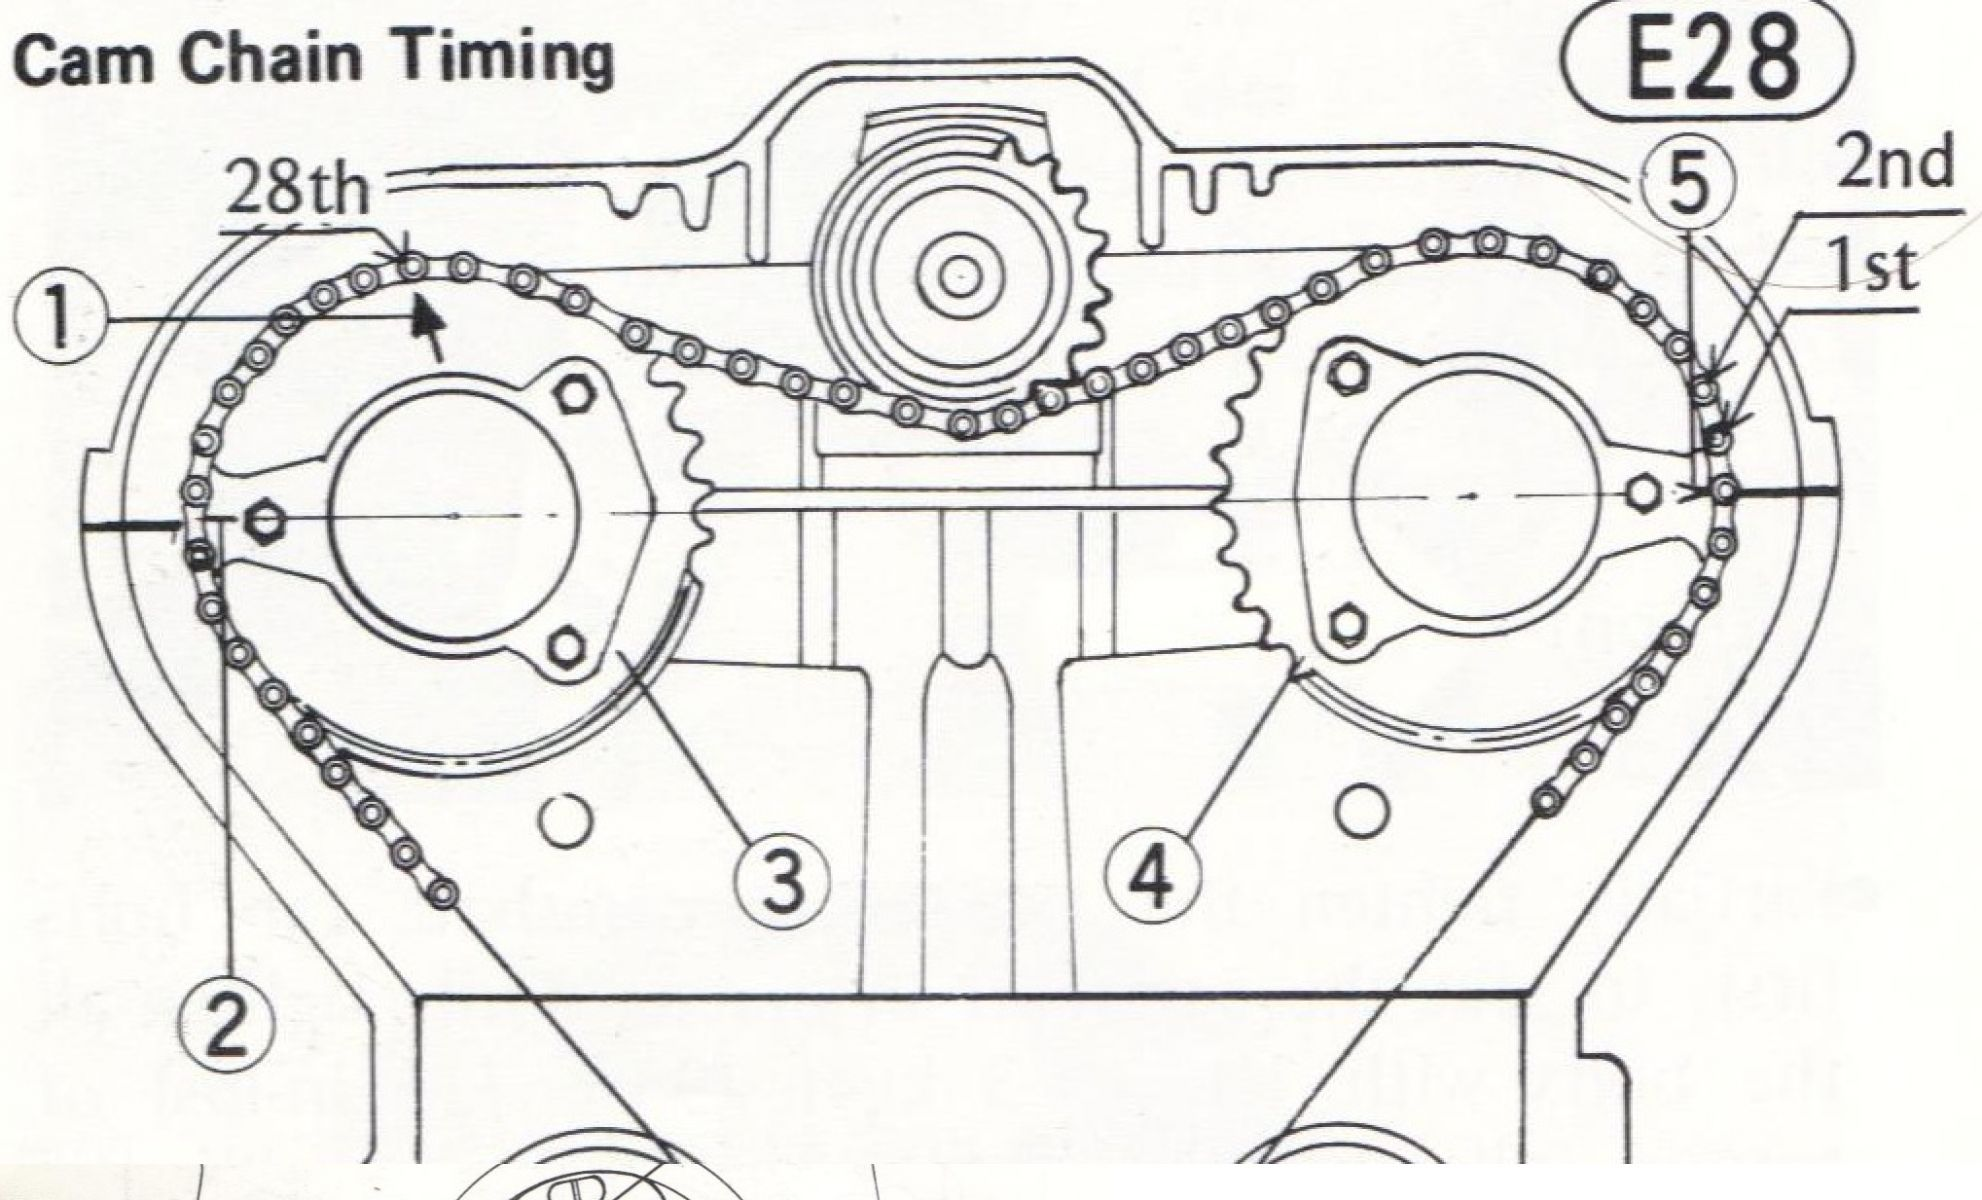 79 Kz Cam Timing Help